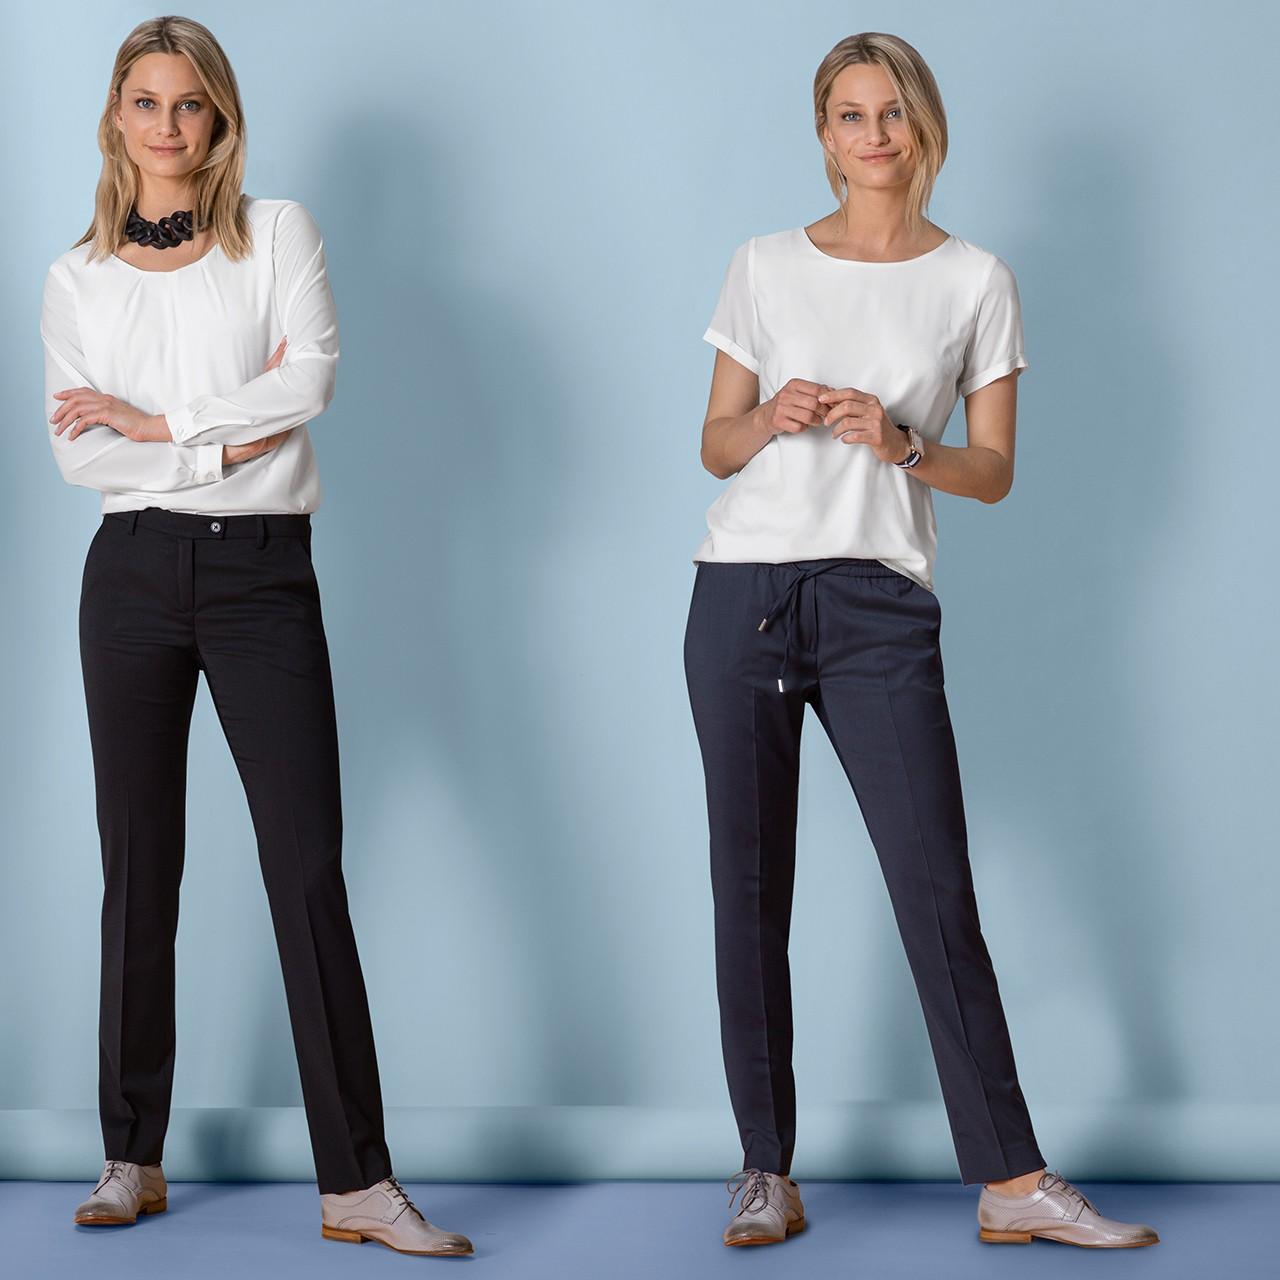 Damen Modern-Joggpants Regular Fit Greiff® | bedrucken, besticken, bedrucken lassen, besticken lassen, mit Logo |